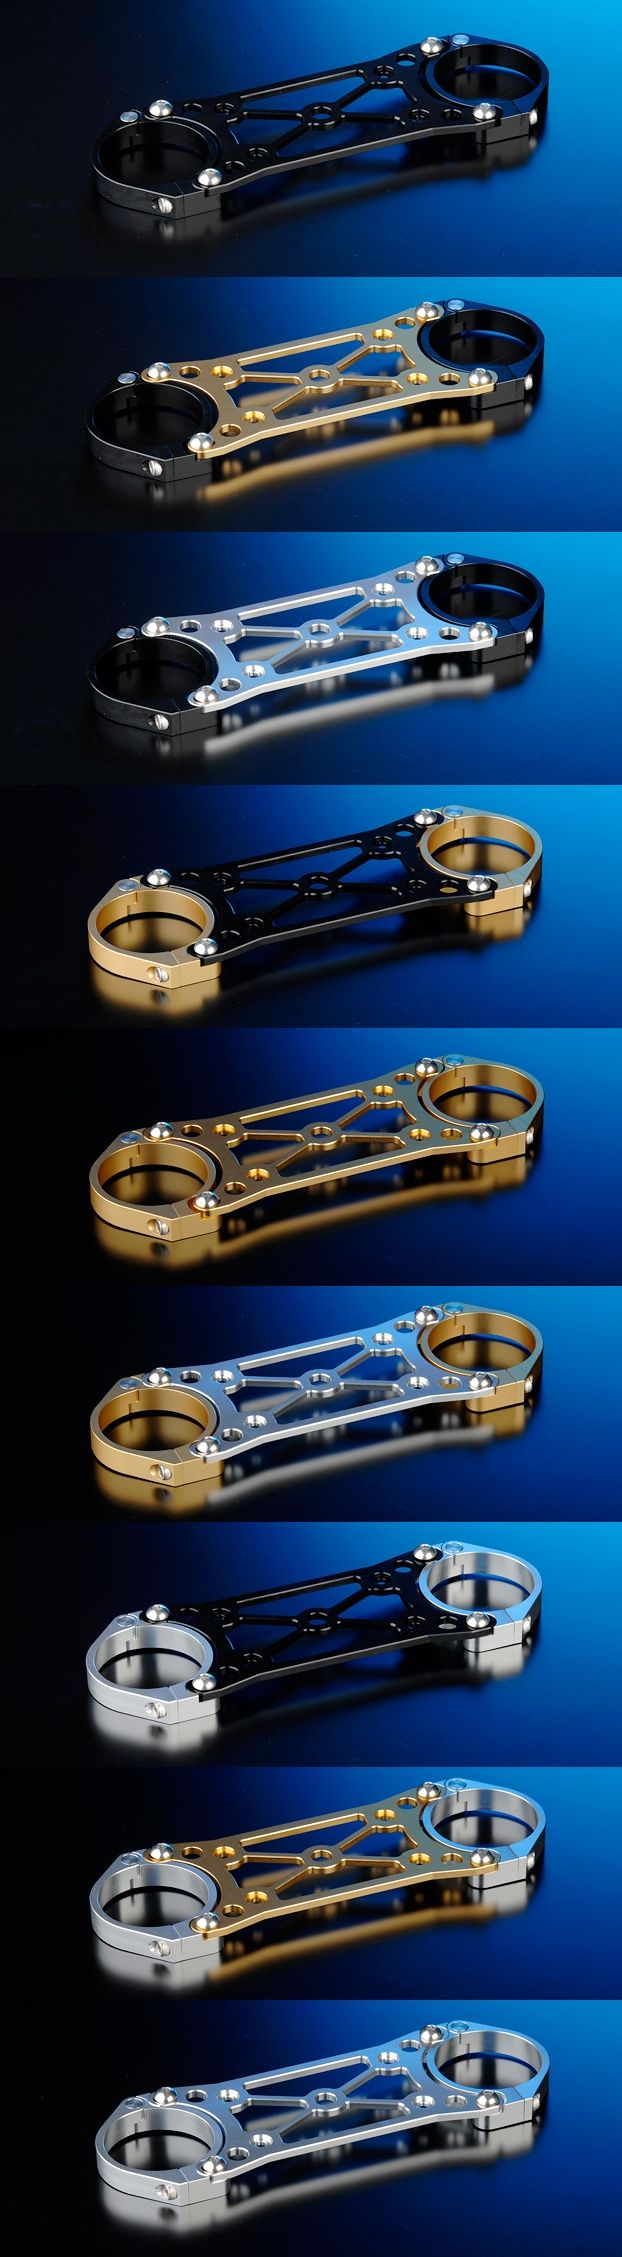 【NITRO RACING】OHLINSφ43正立式前叉専用 碳纖維前土除/前叉穩定器(手銬)套件 (Racing 17吋用) - 「Webike-摩托百貨」